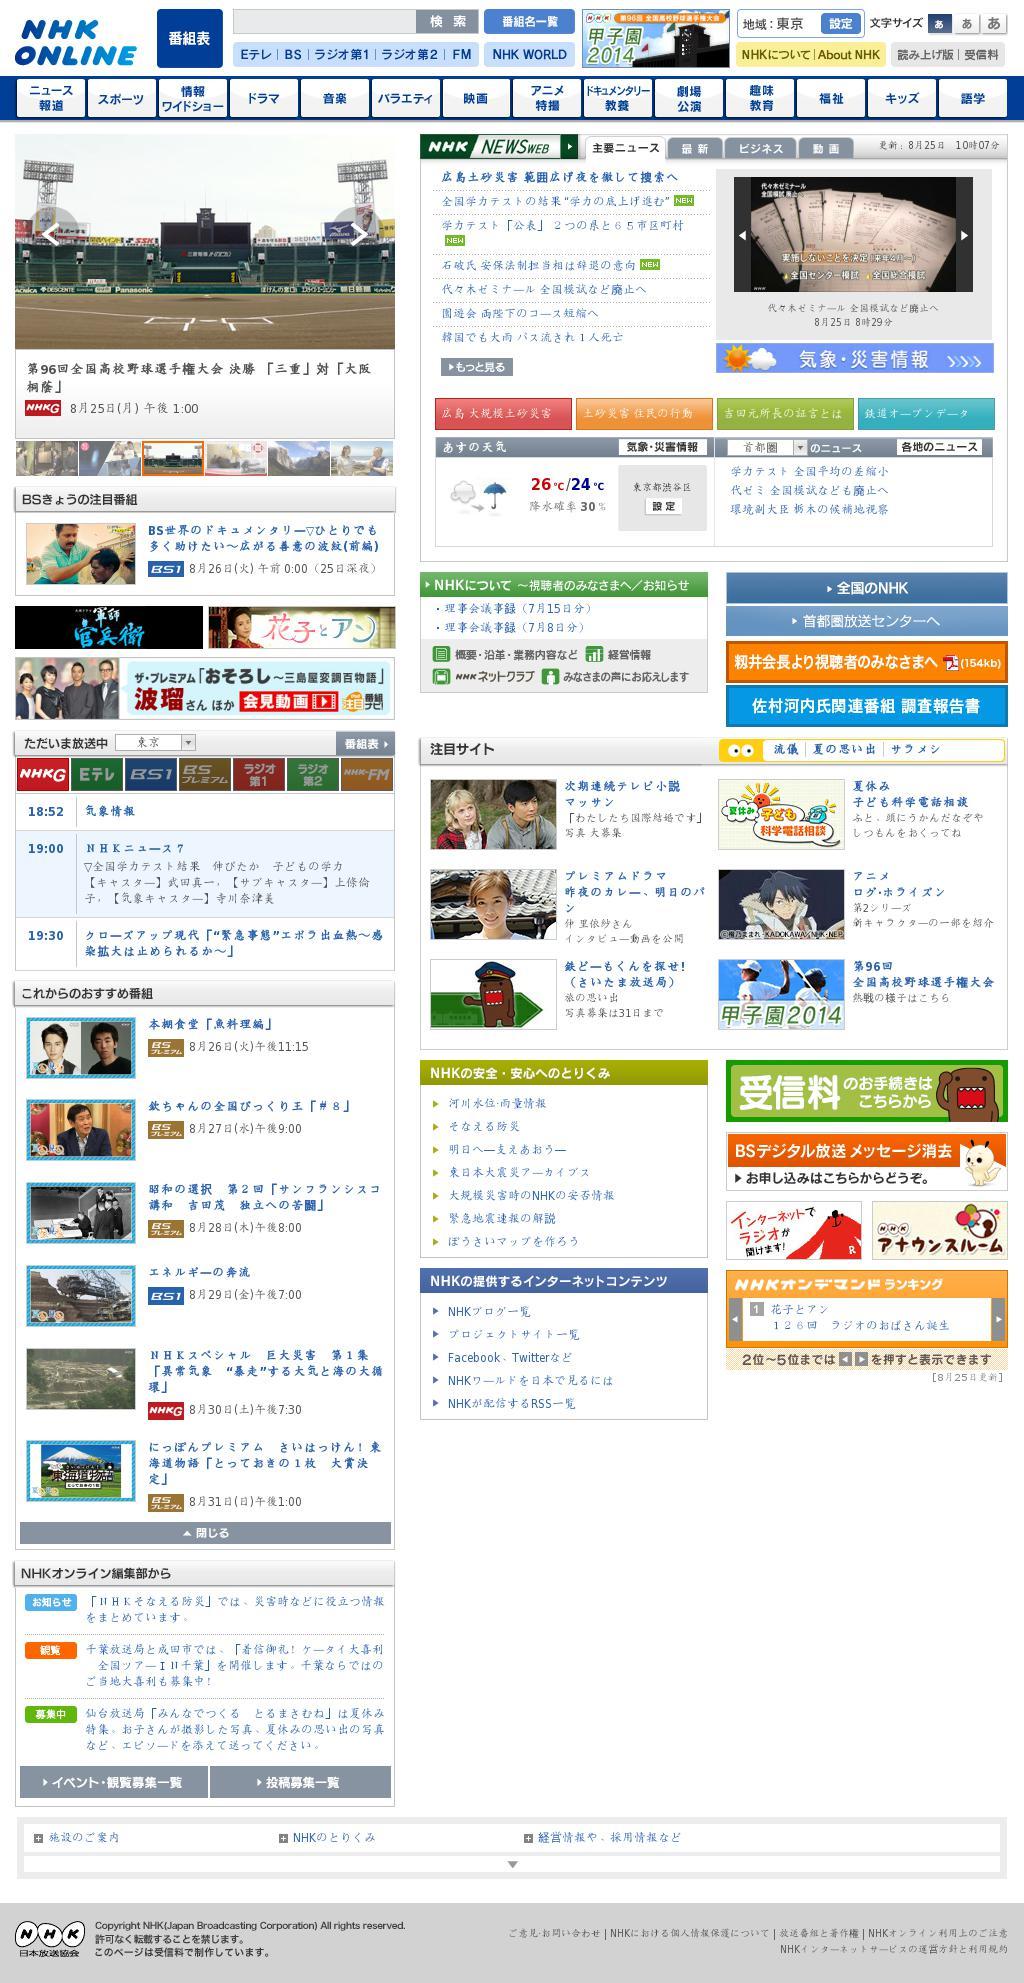 NHK Online at Monday Aug. 25, 2014, 10:15 a.m. UTC